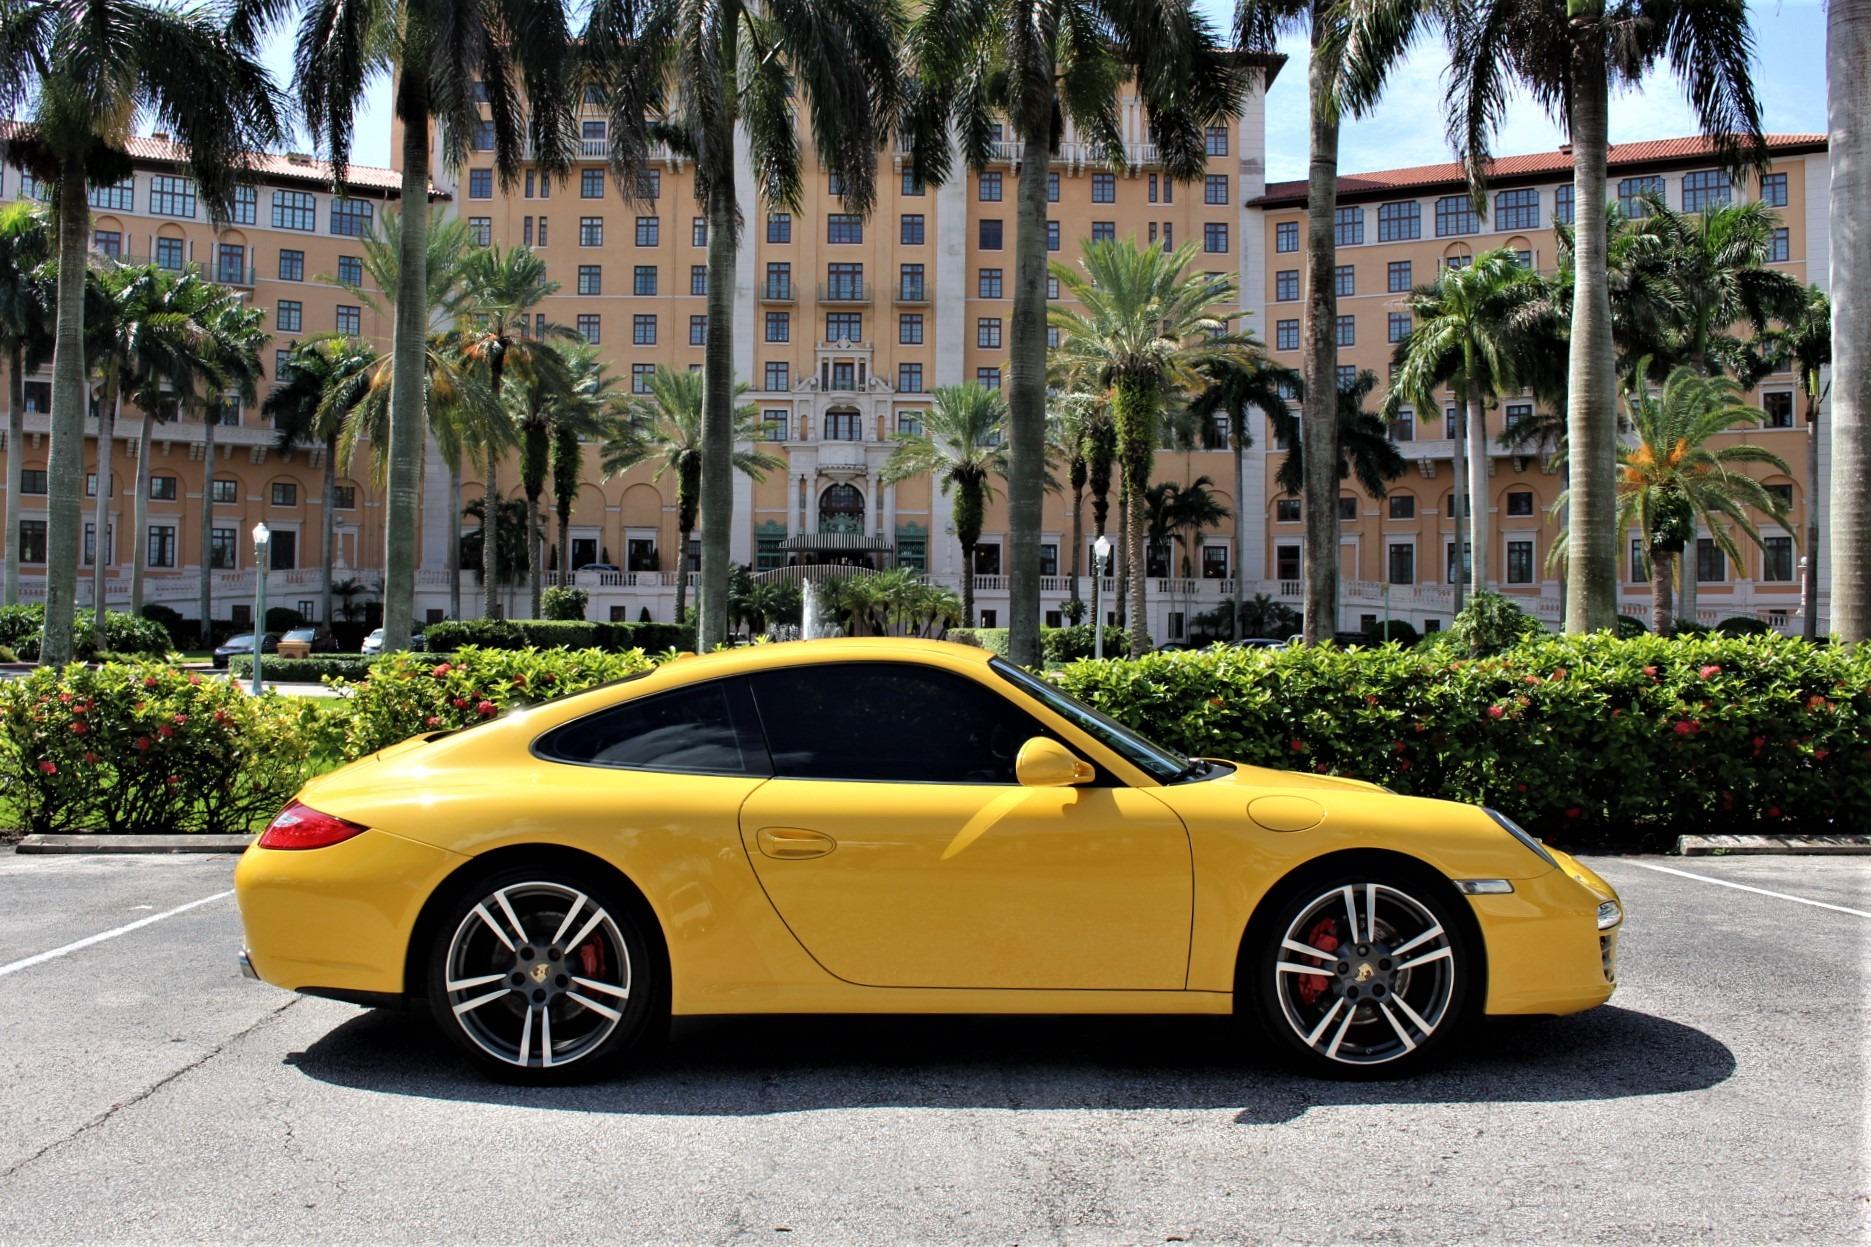 Used 2011 Porsche 911 Carrera 4S for sale $79,850 at The Gables Sports Cars in Miami FL 33146 2